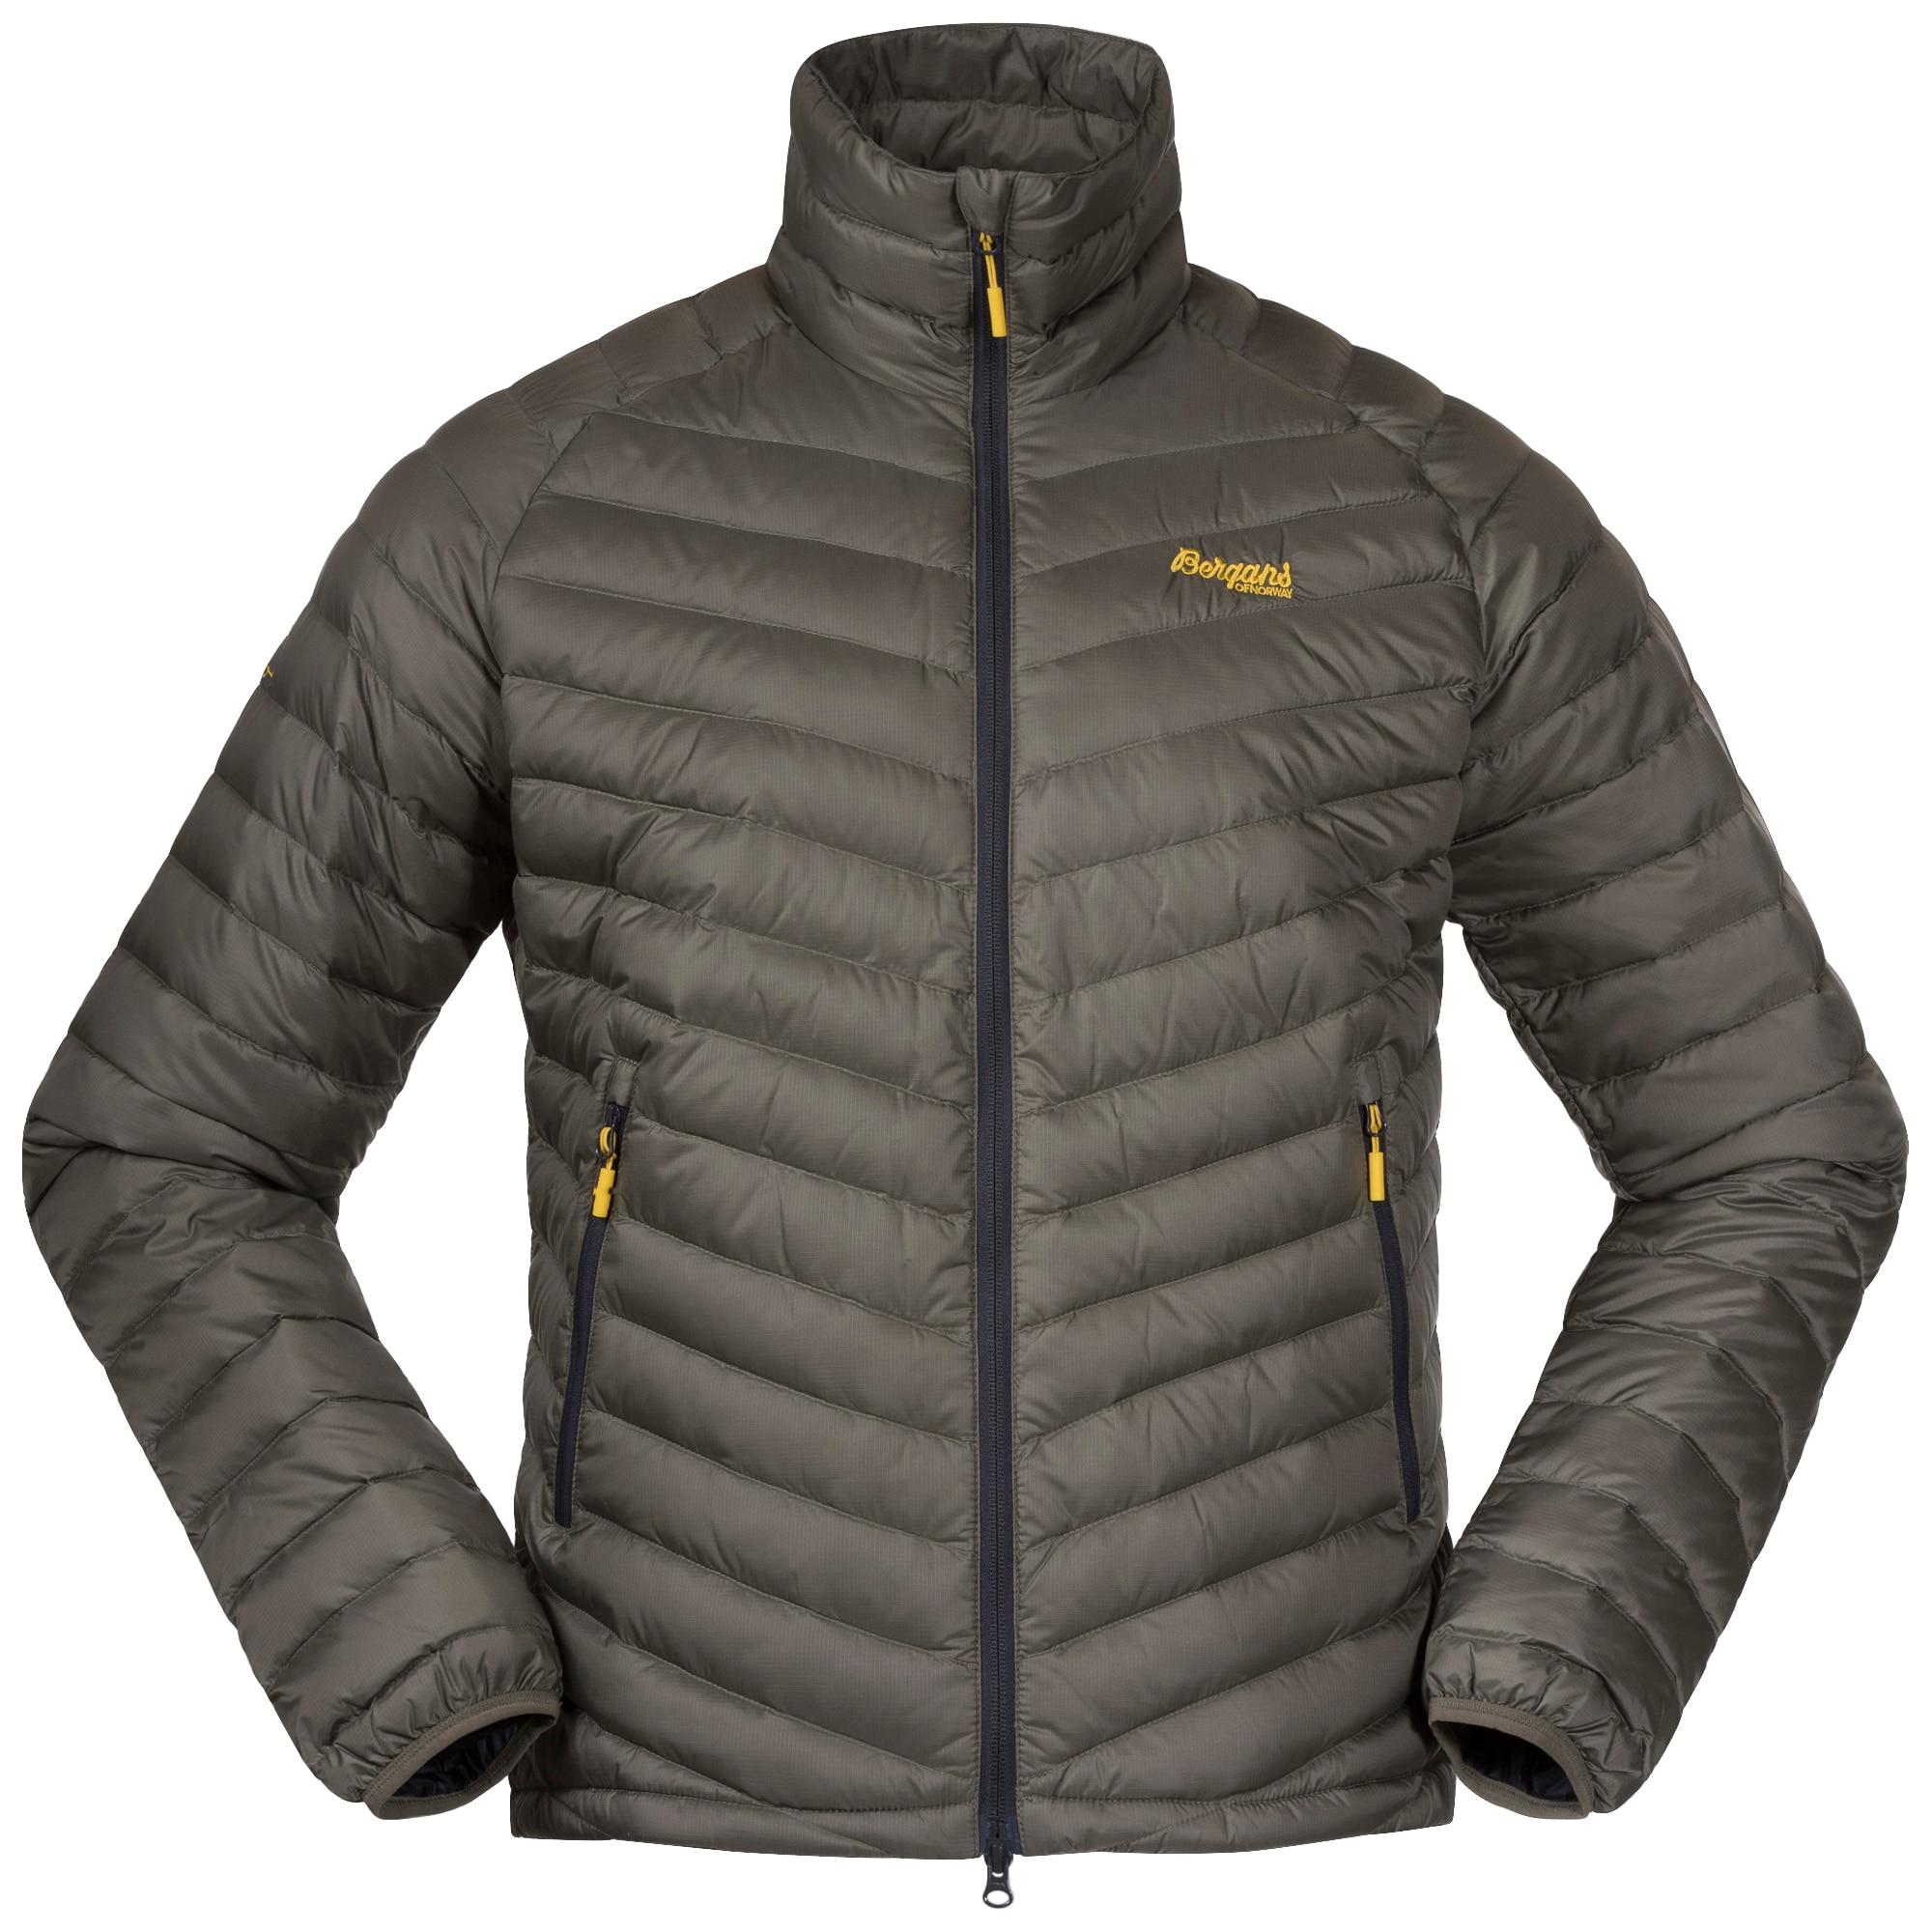 Romsdal Down Jacket